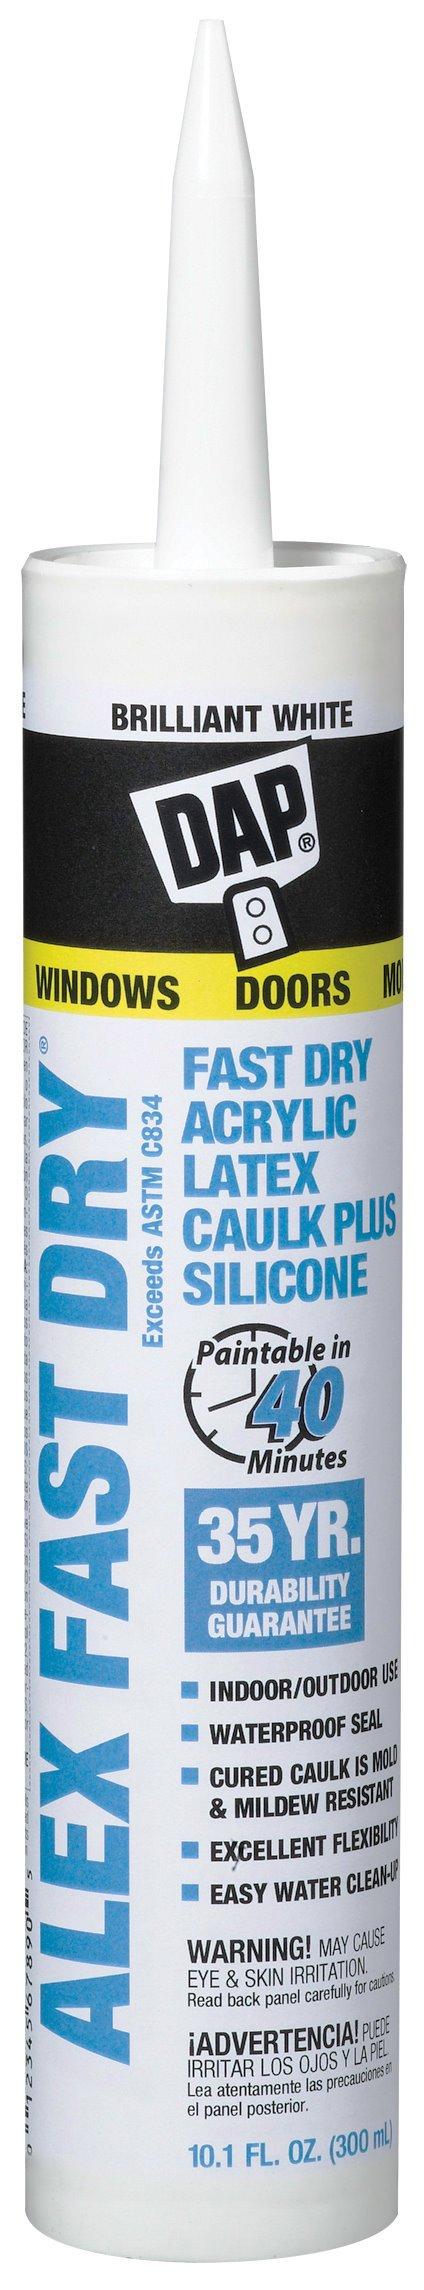 Dap Inc 18425 10.1 oz. Alex Fast Dry Acrylic Latex Caulk Plus Silicone - White by DAP